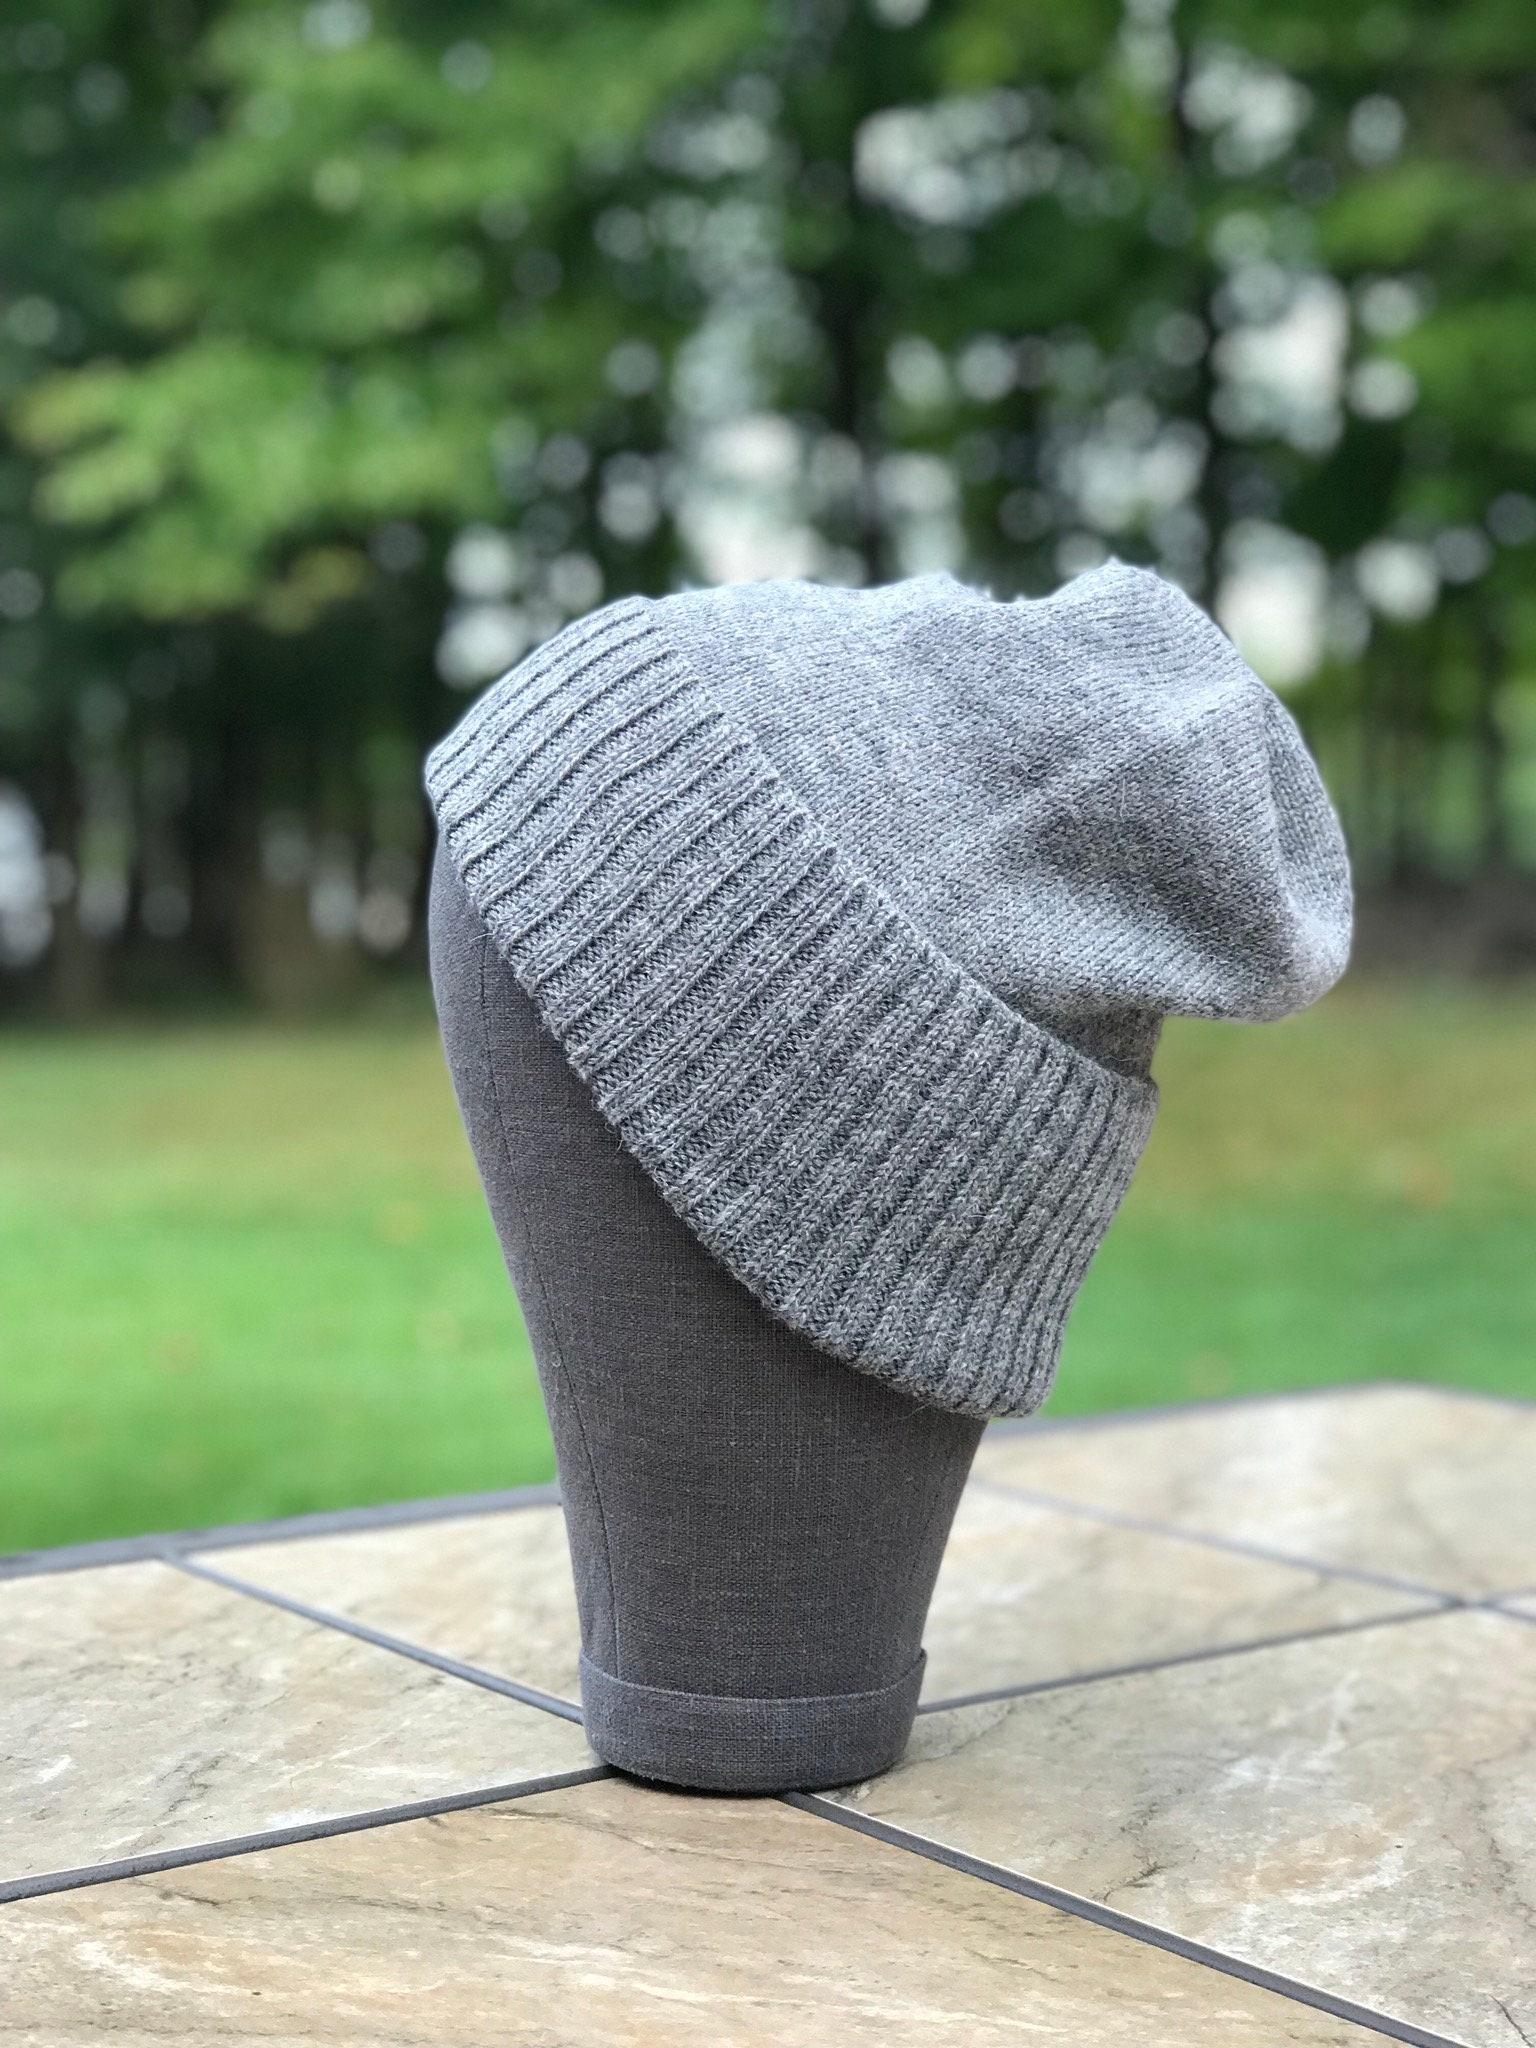 Drawing Flamingos Warm Winter Hat Knit Beanie Skull Cap Cuff Beanie Hat Winter Hats for Men /& Women